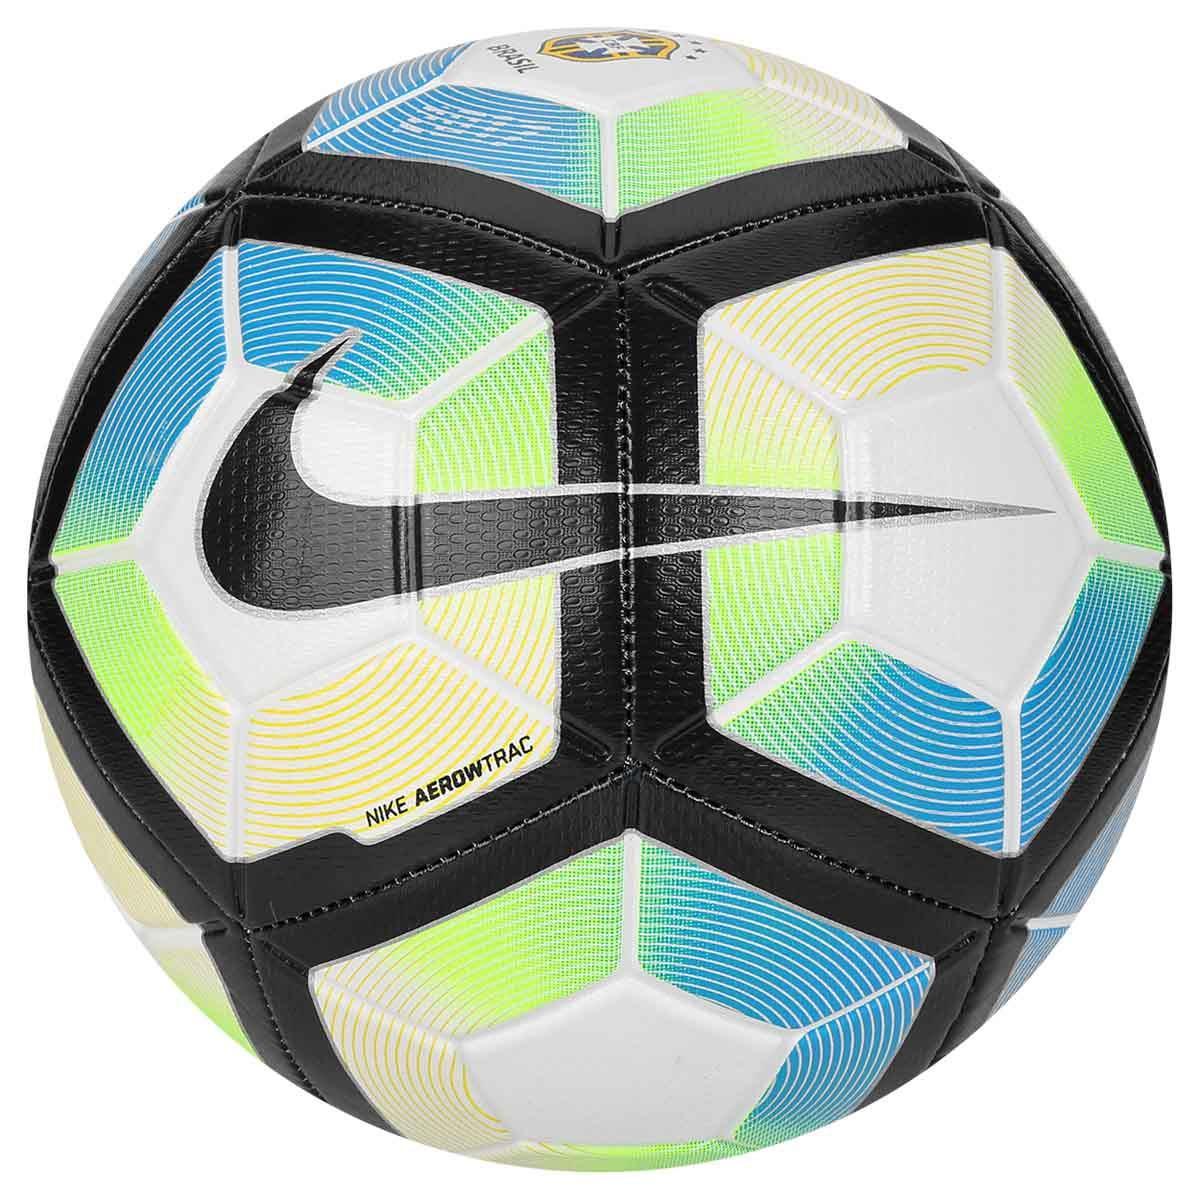 f86a57dd5380b Bola Nike Strike Cbf Futebol De Campo Aerowtrac Original Cnf - R ...